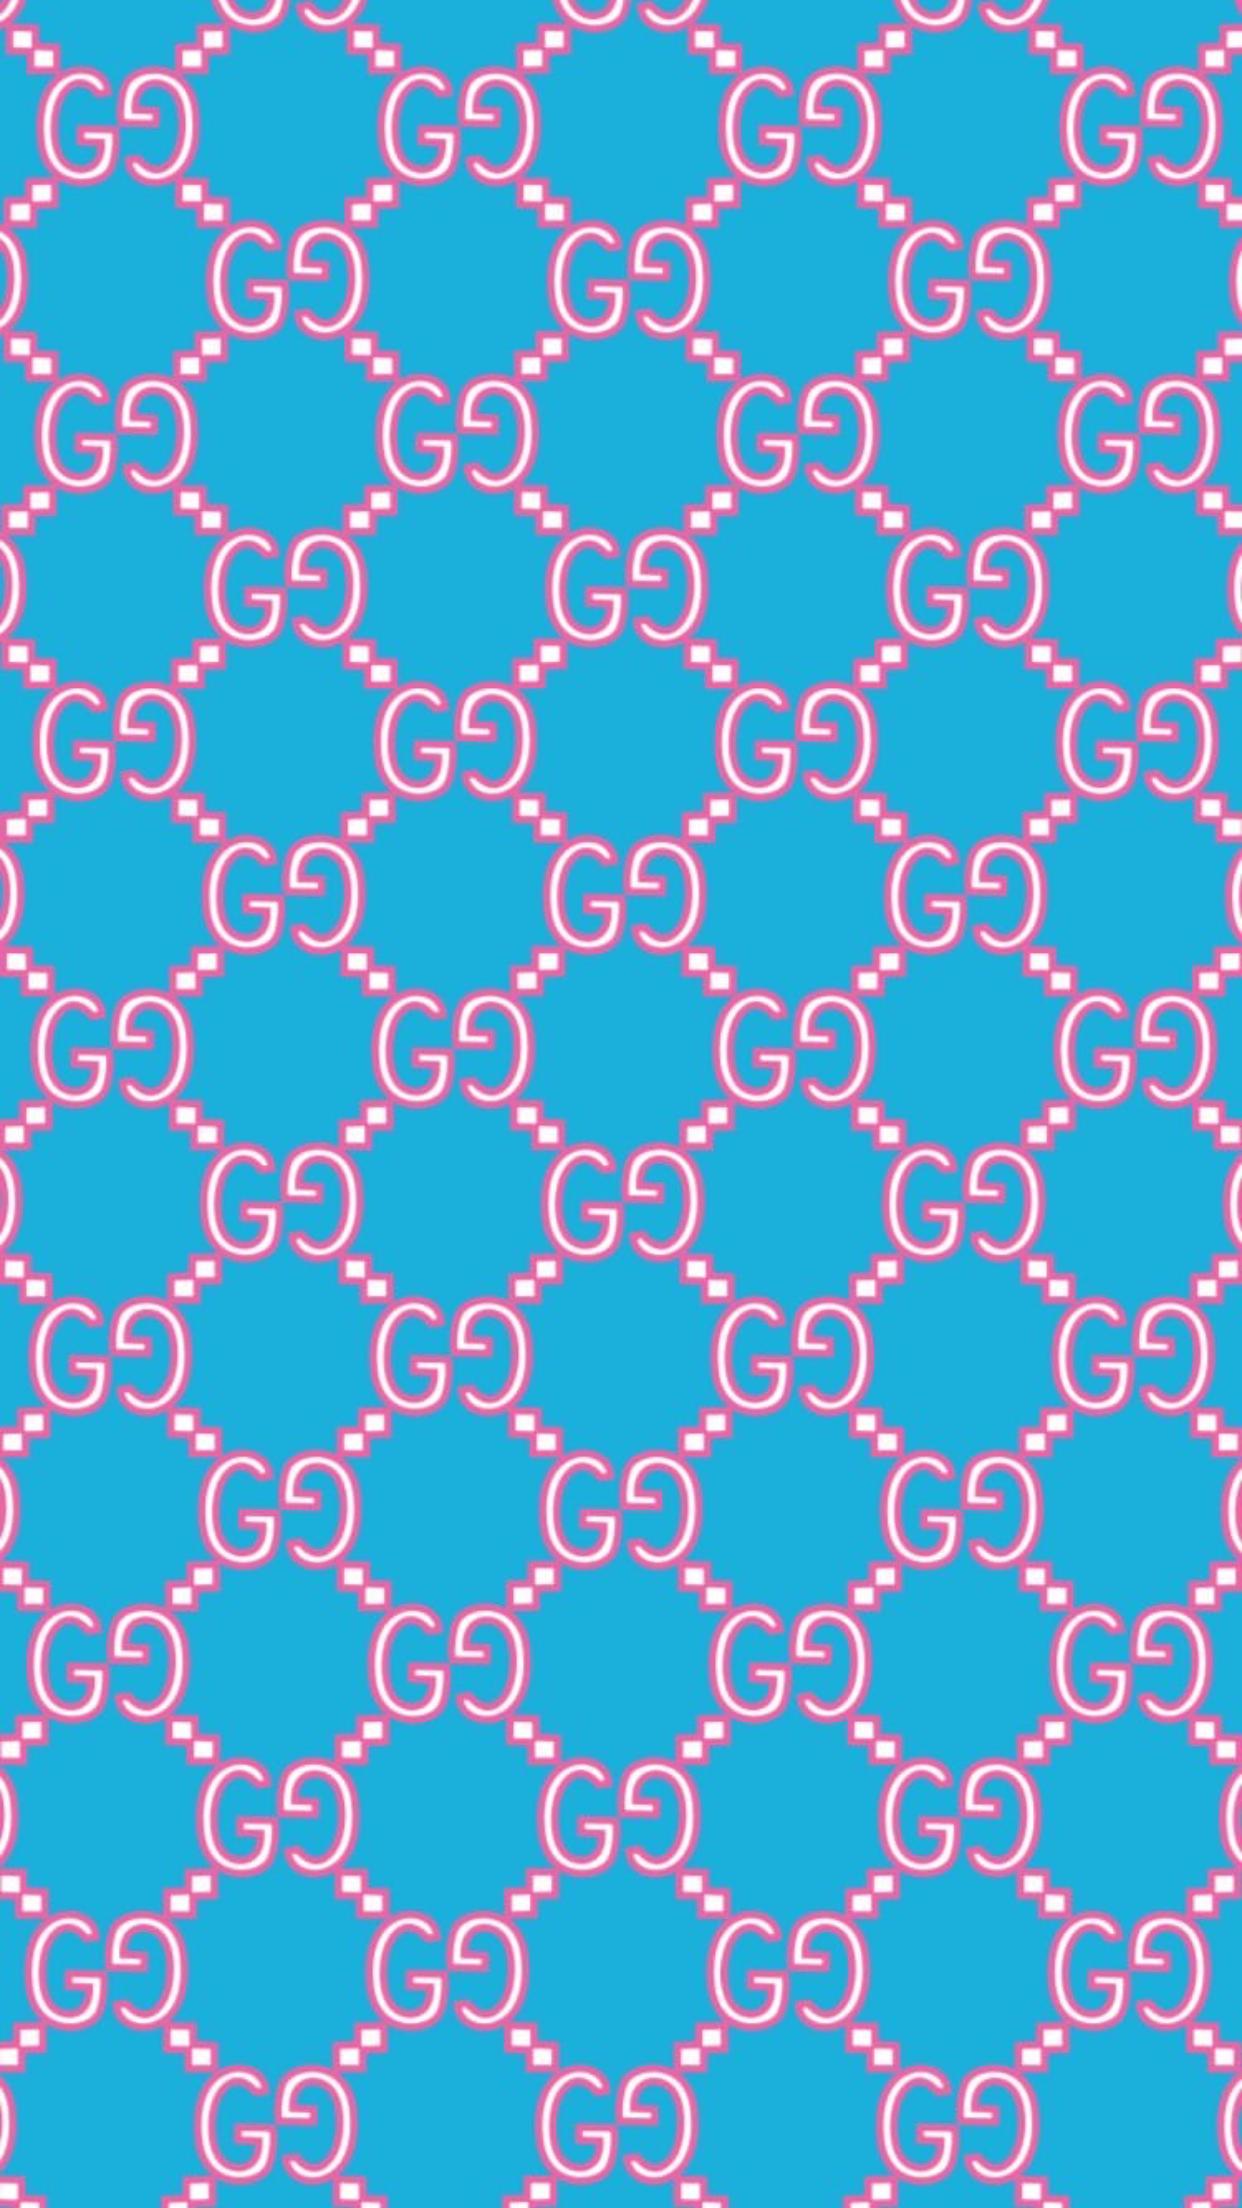 GUCCI WALLPAPER Iphone wallpaper hipster Gucci wallpaper iphone 1242x2208